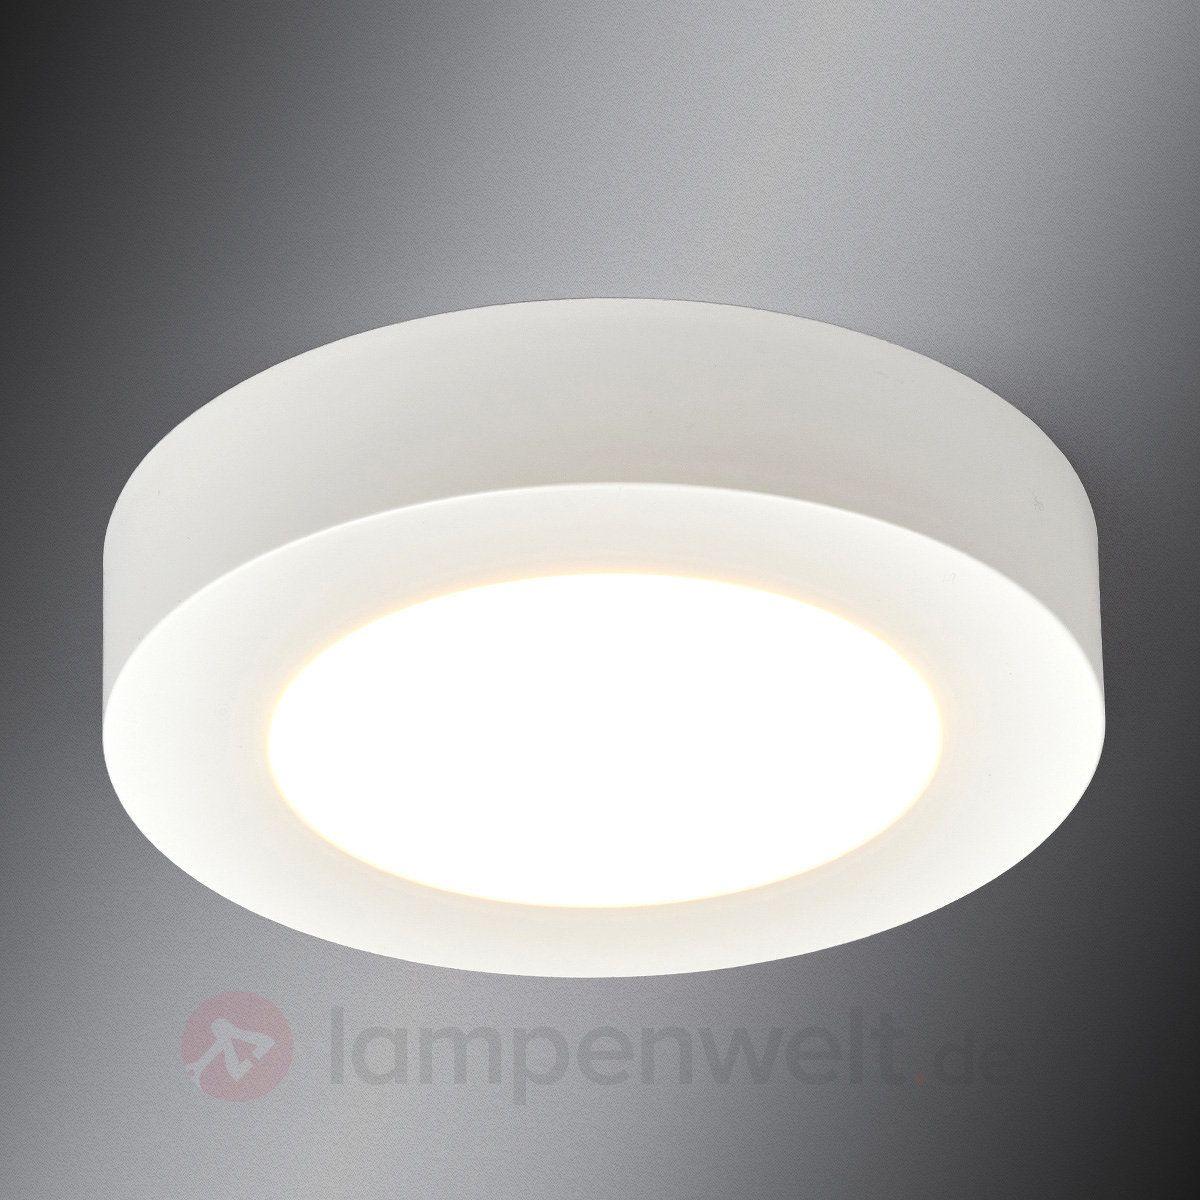 Runde Led Deckenlampe Esra Furs Badezimmer Kaufen Deckenlampe Led Deckenlampen Und Led